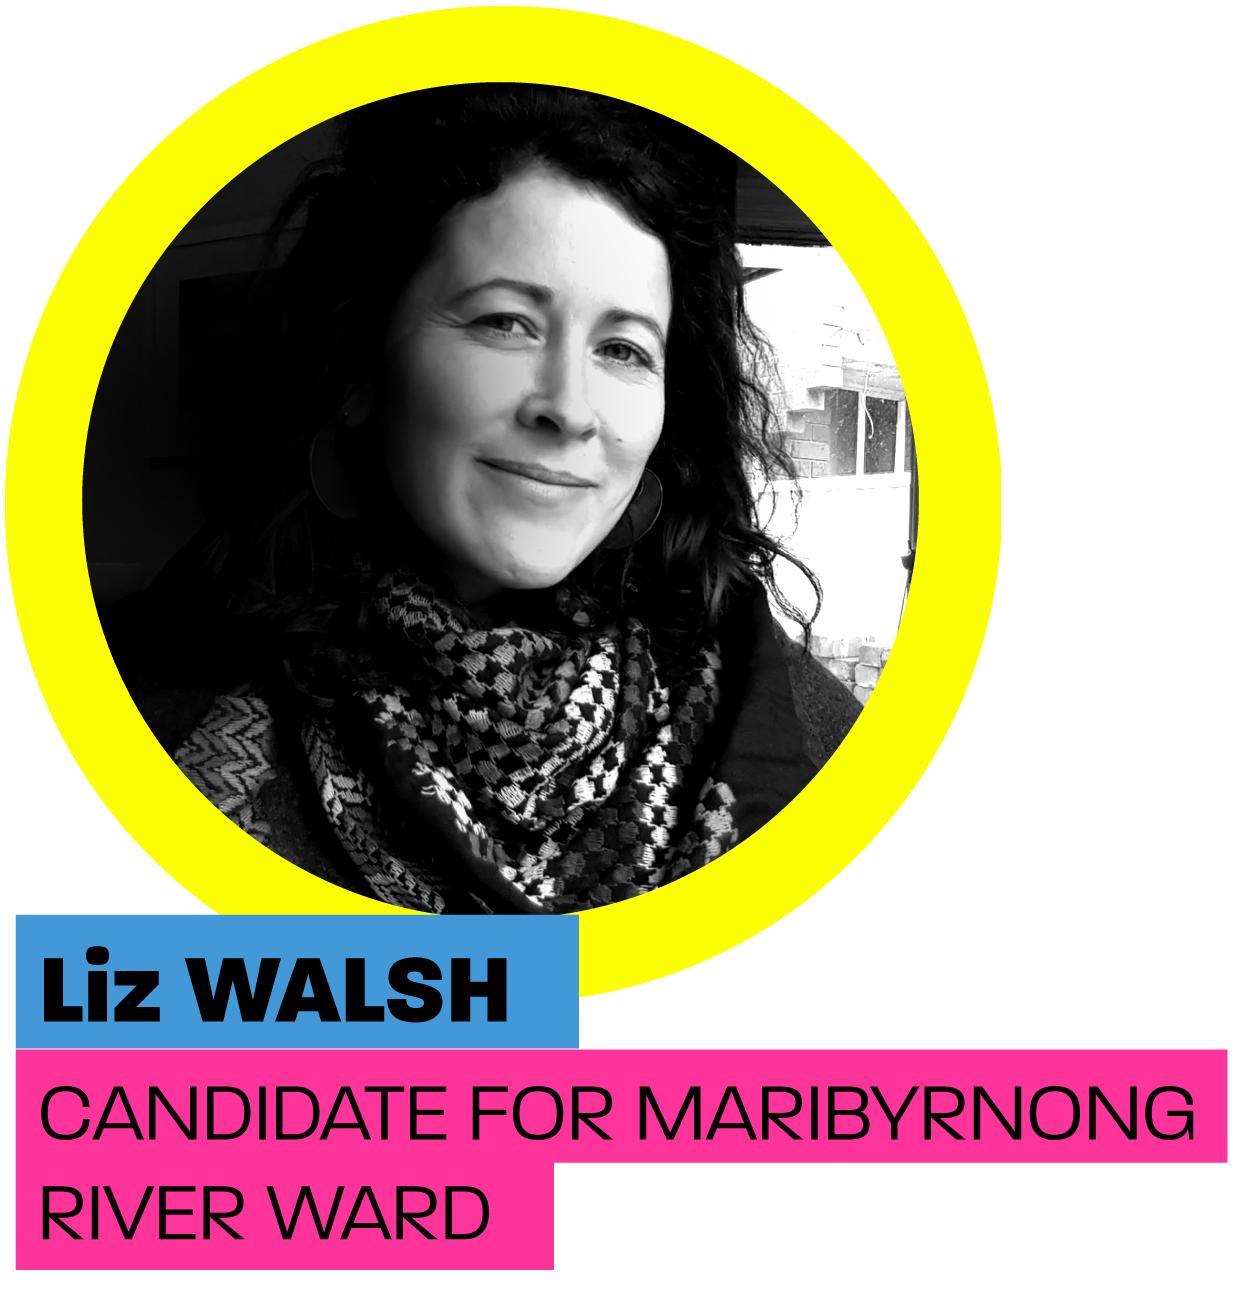 Liz Walsh